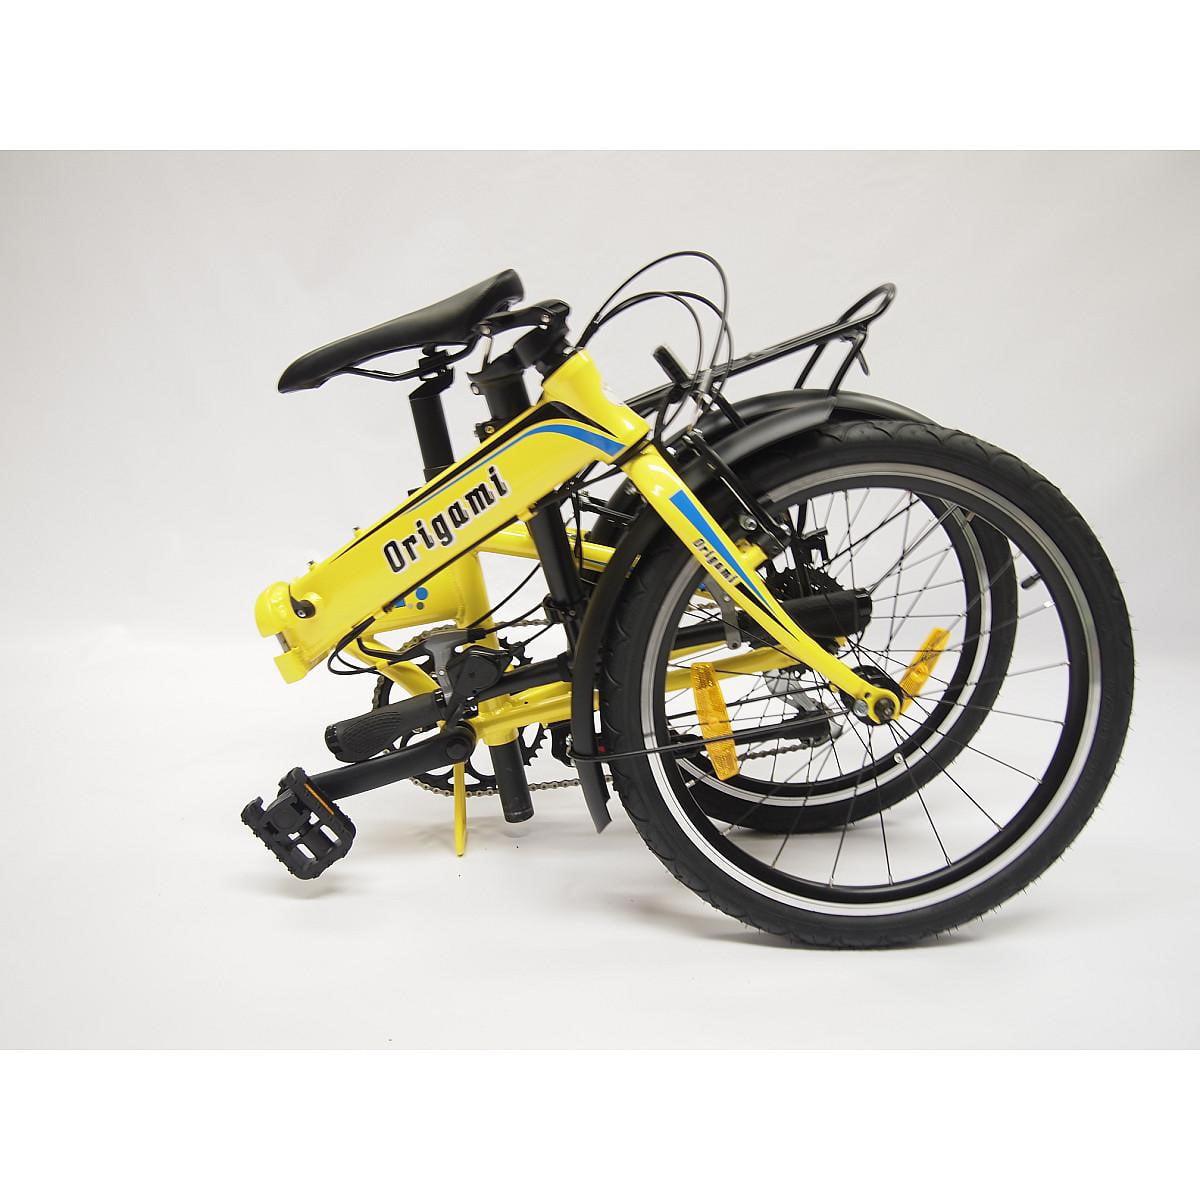 "Origami Crane 8 Speed Folding Bicycle, Pearl Yellow, 13""/Medium"